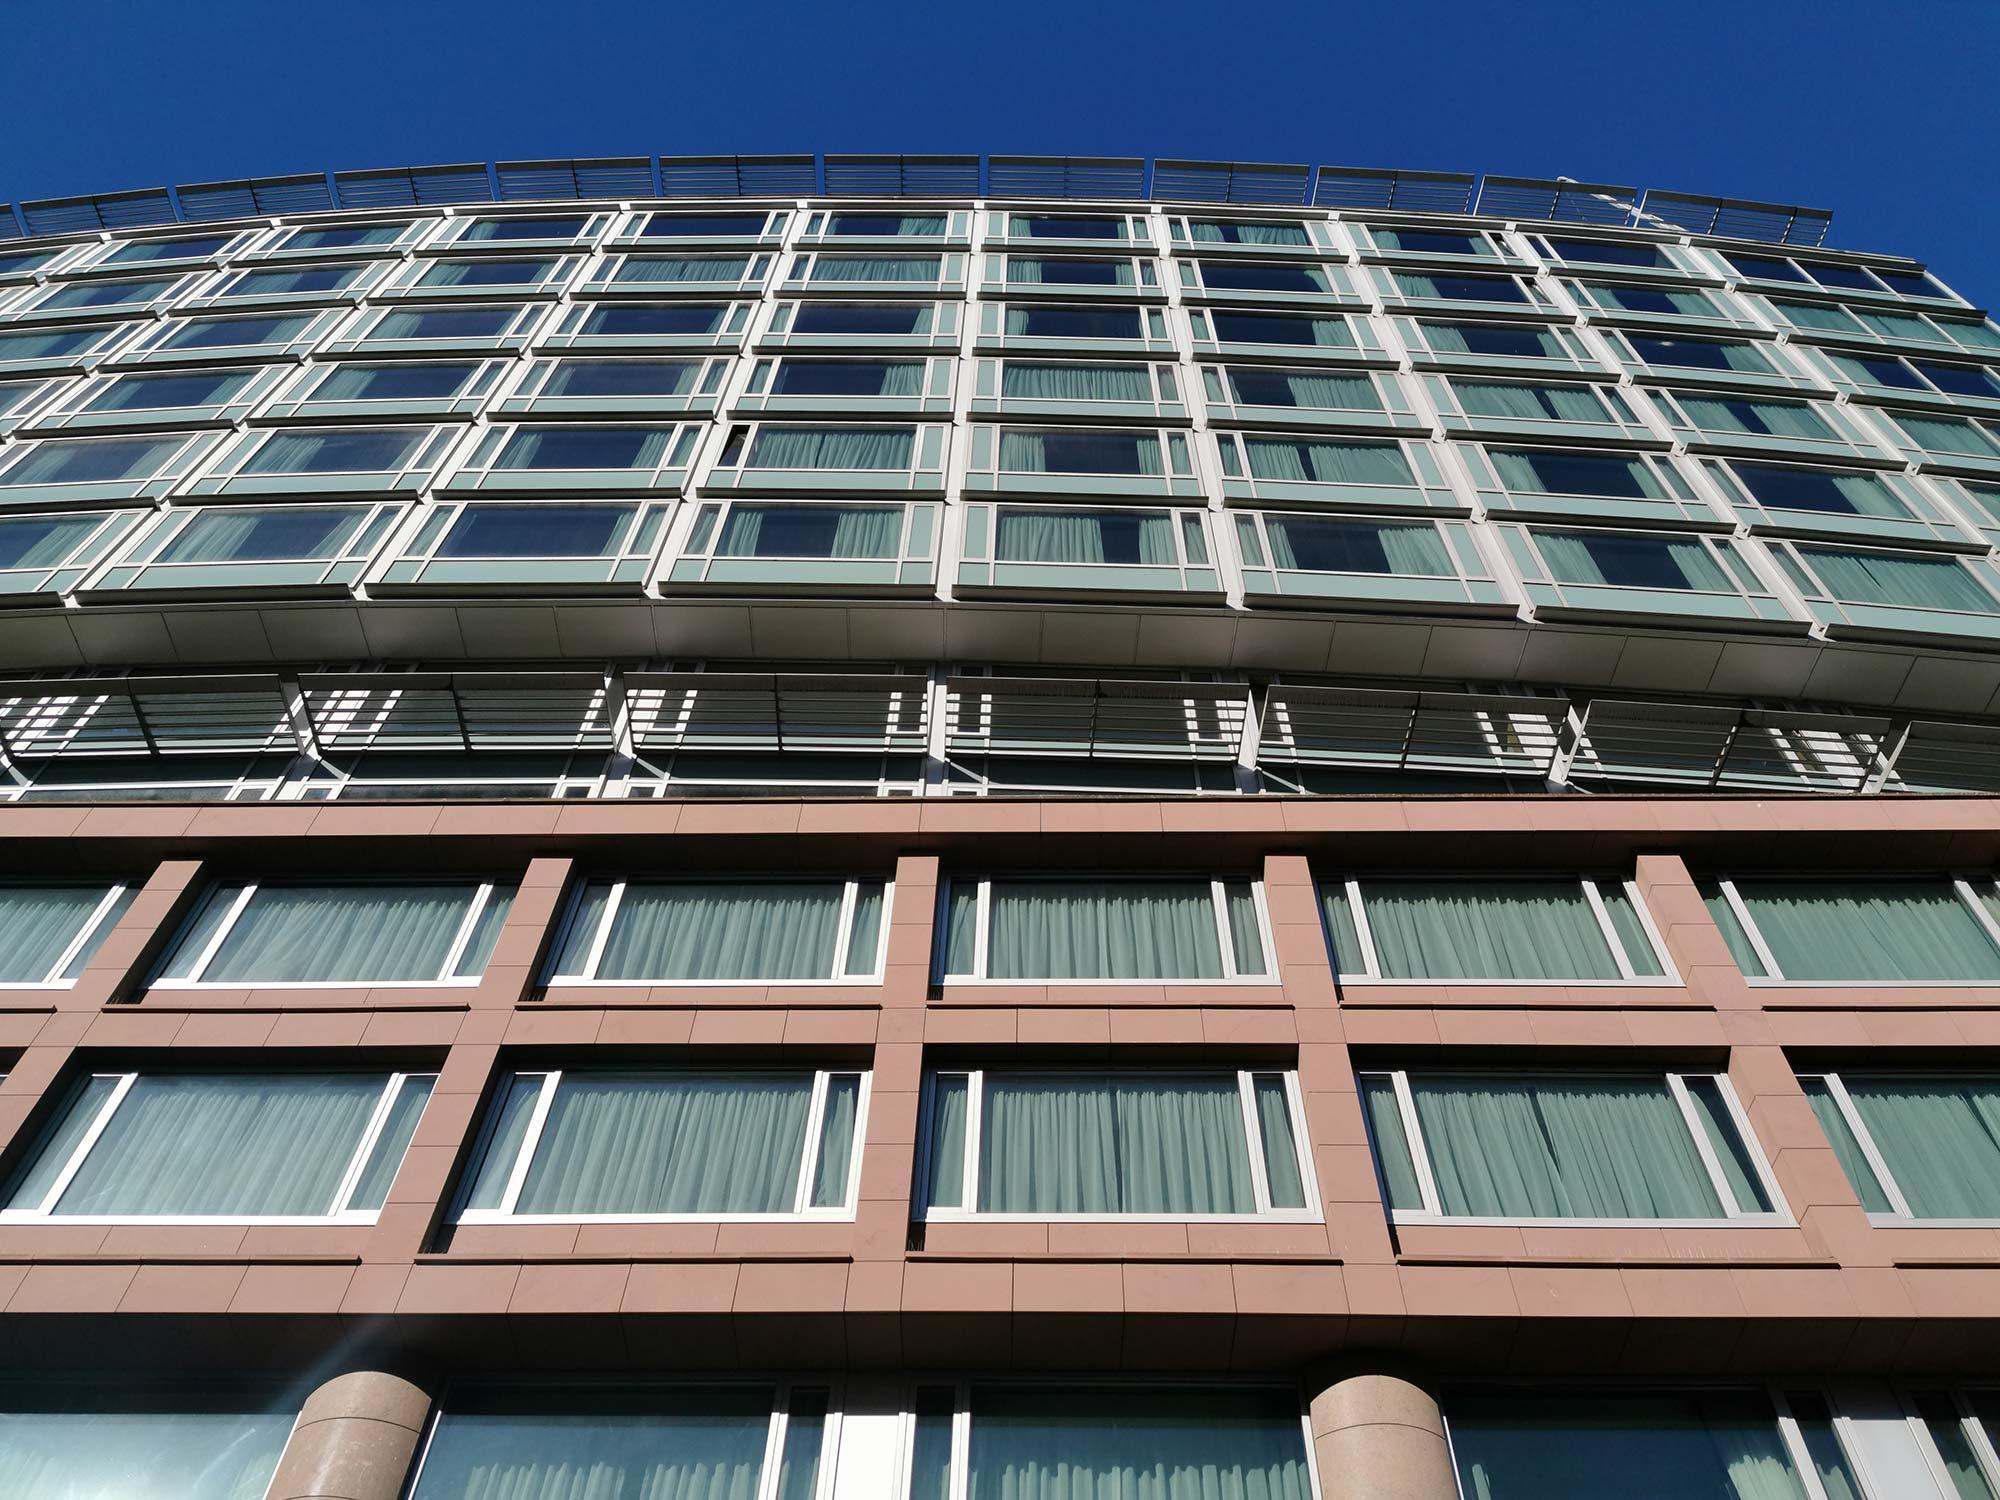 Frankfurt Hilton Hotel Fassade - Hilton Hotel Hochstraße FFM - Hilton City Center Frankfurt am Main - Naturstein Fassade